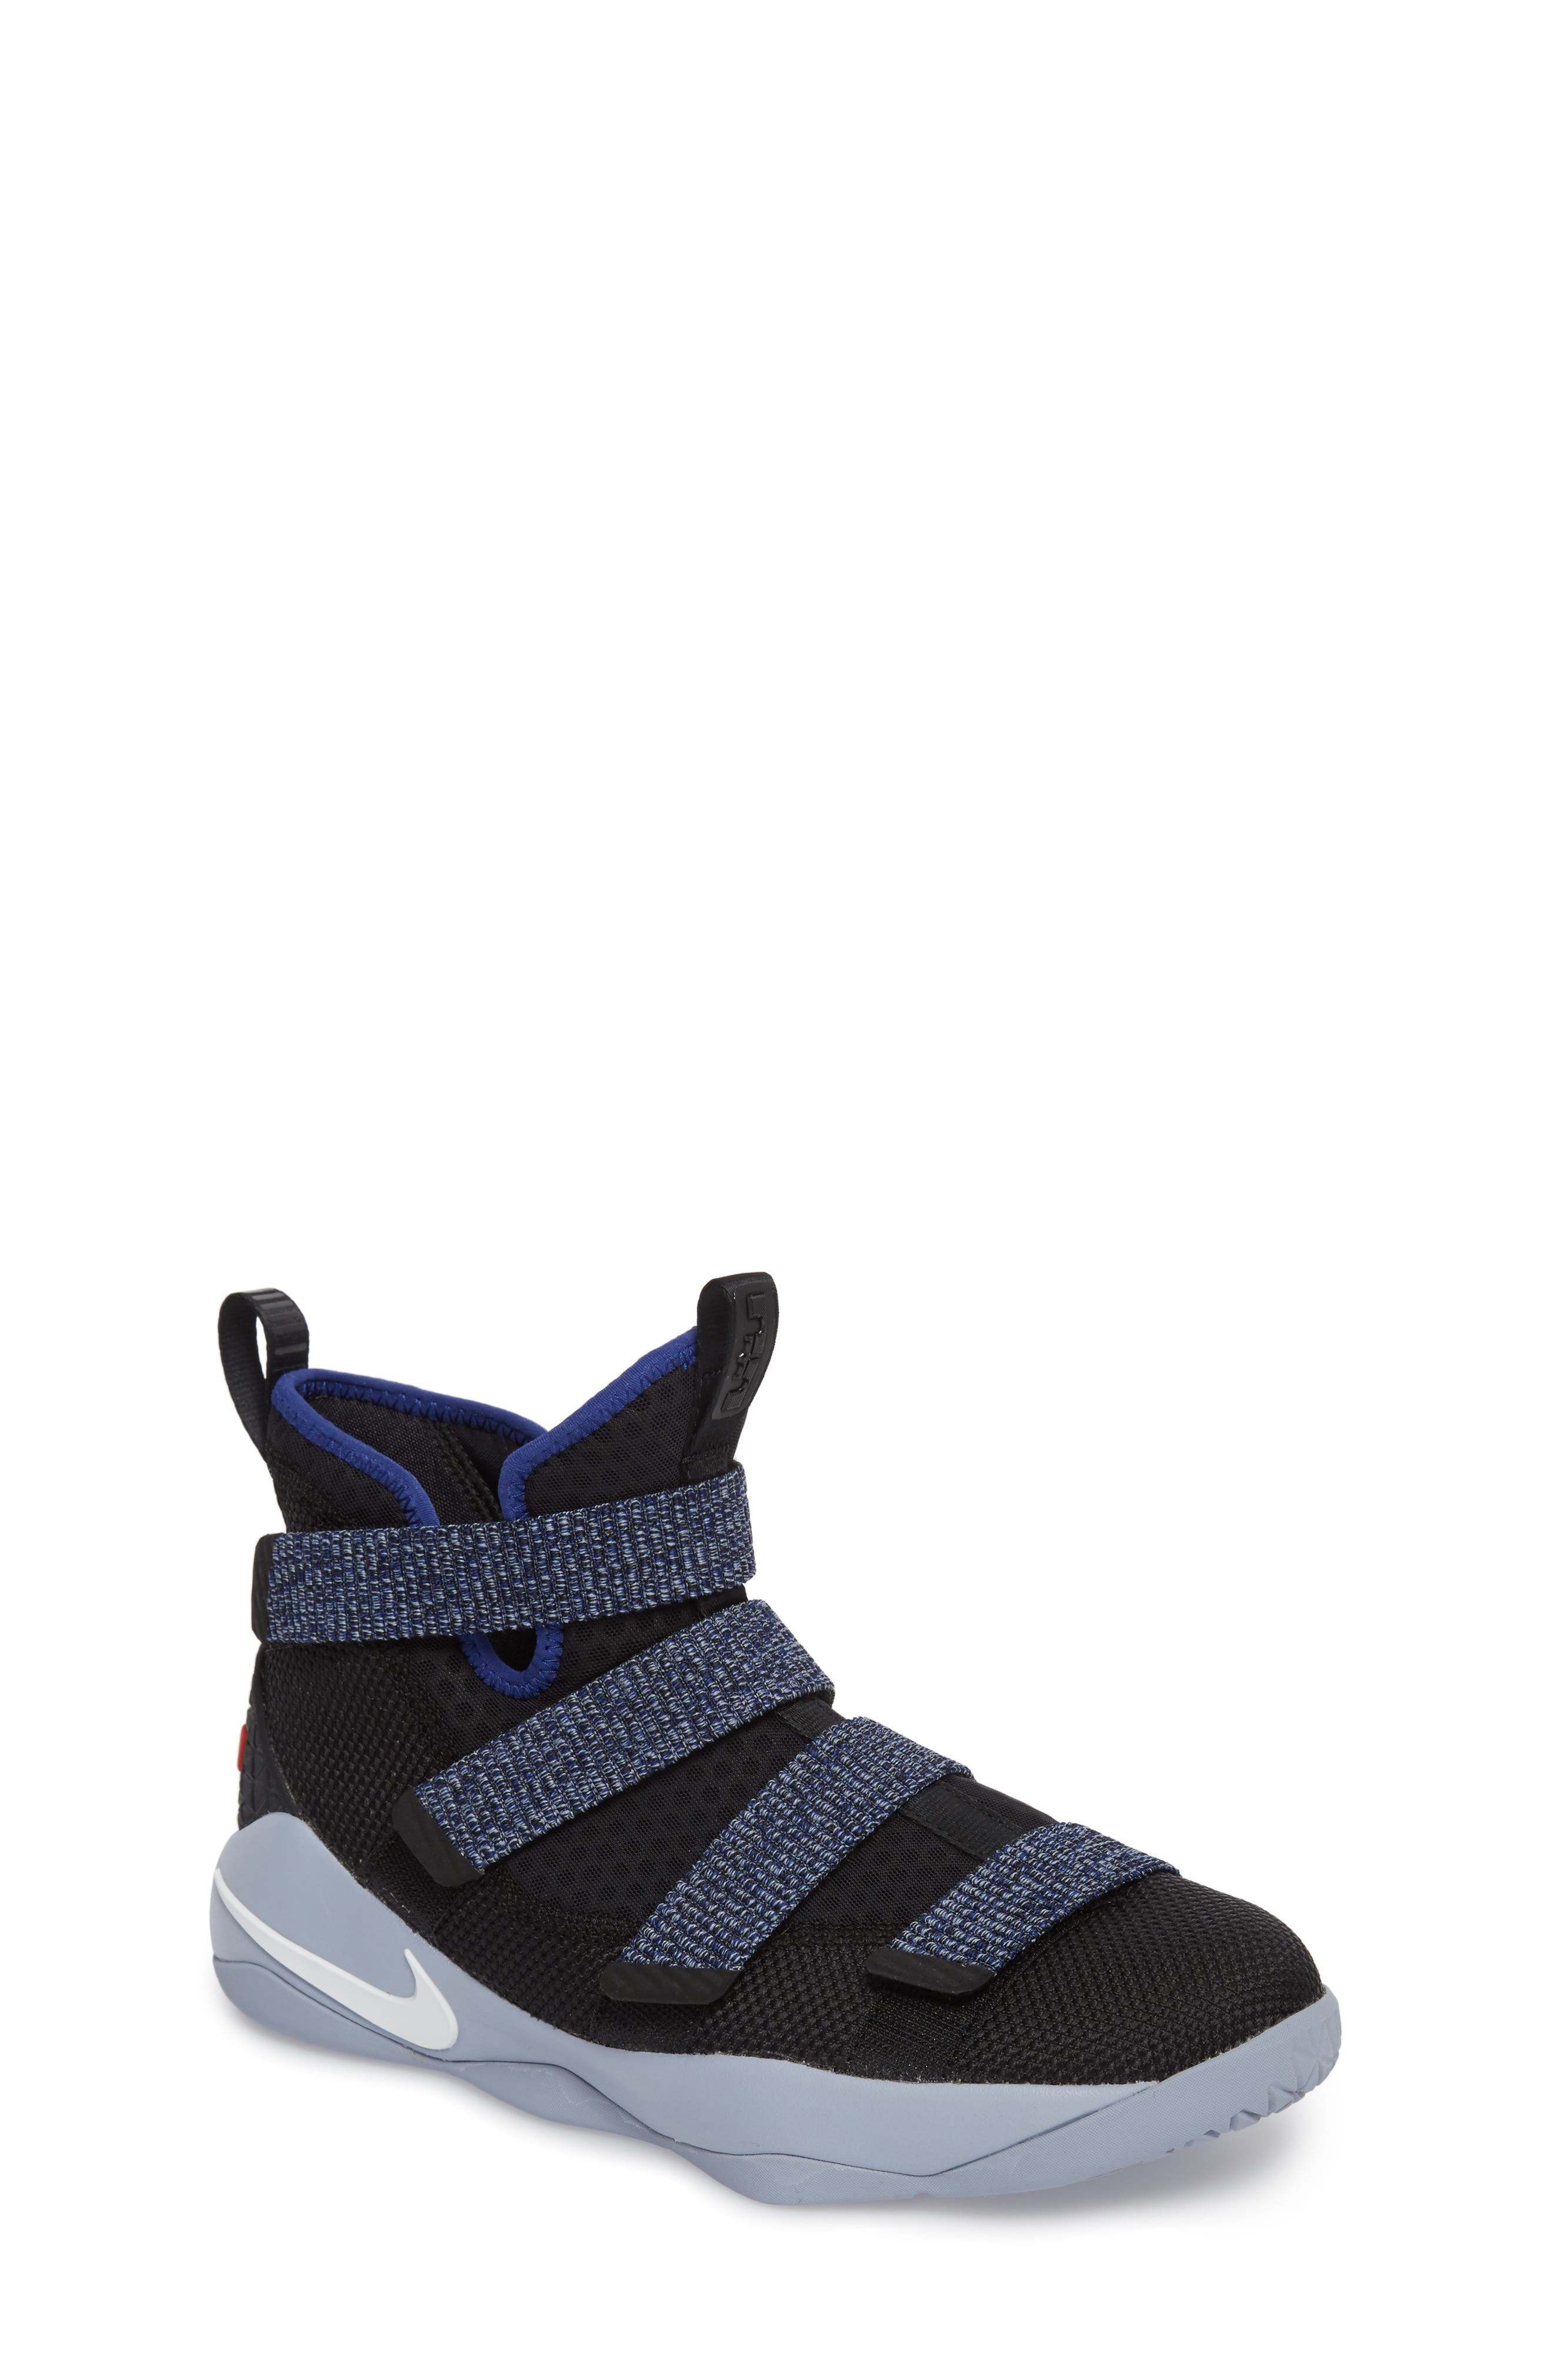 NIKE,                             LeBron Soldier XI Basketball Shoe,                             Main thumbnail 1, color,                             005